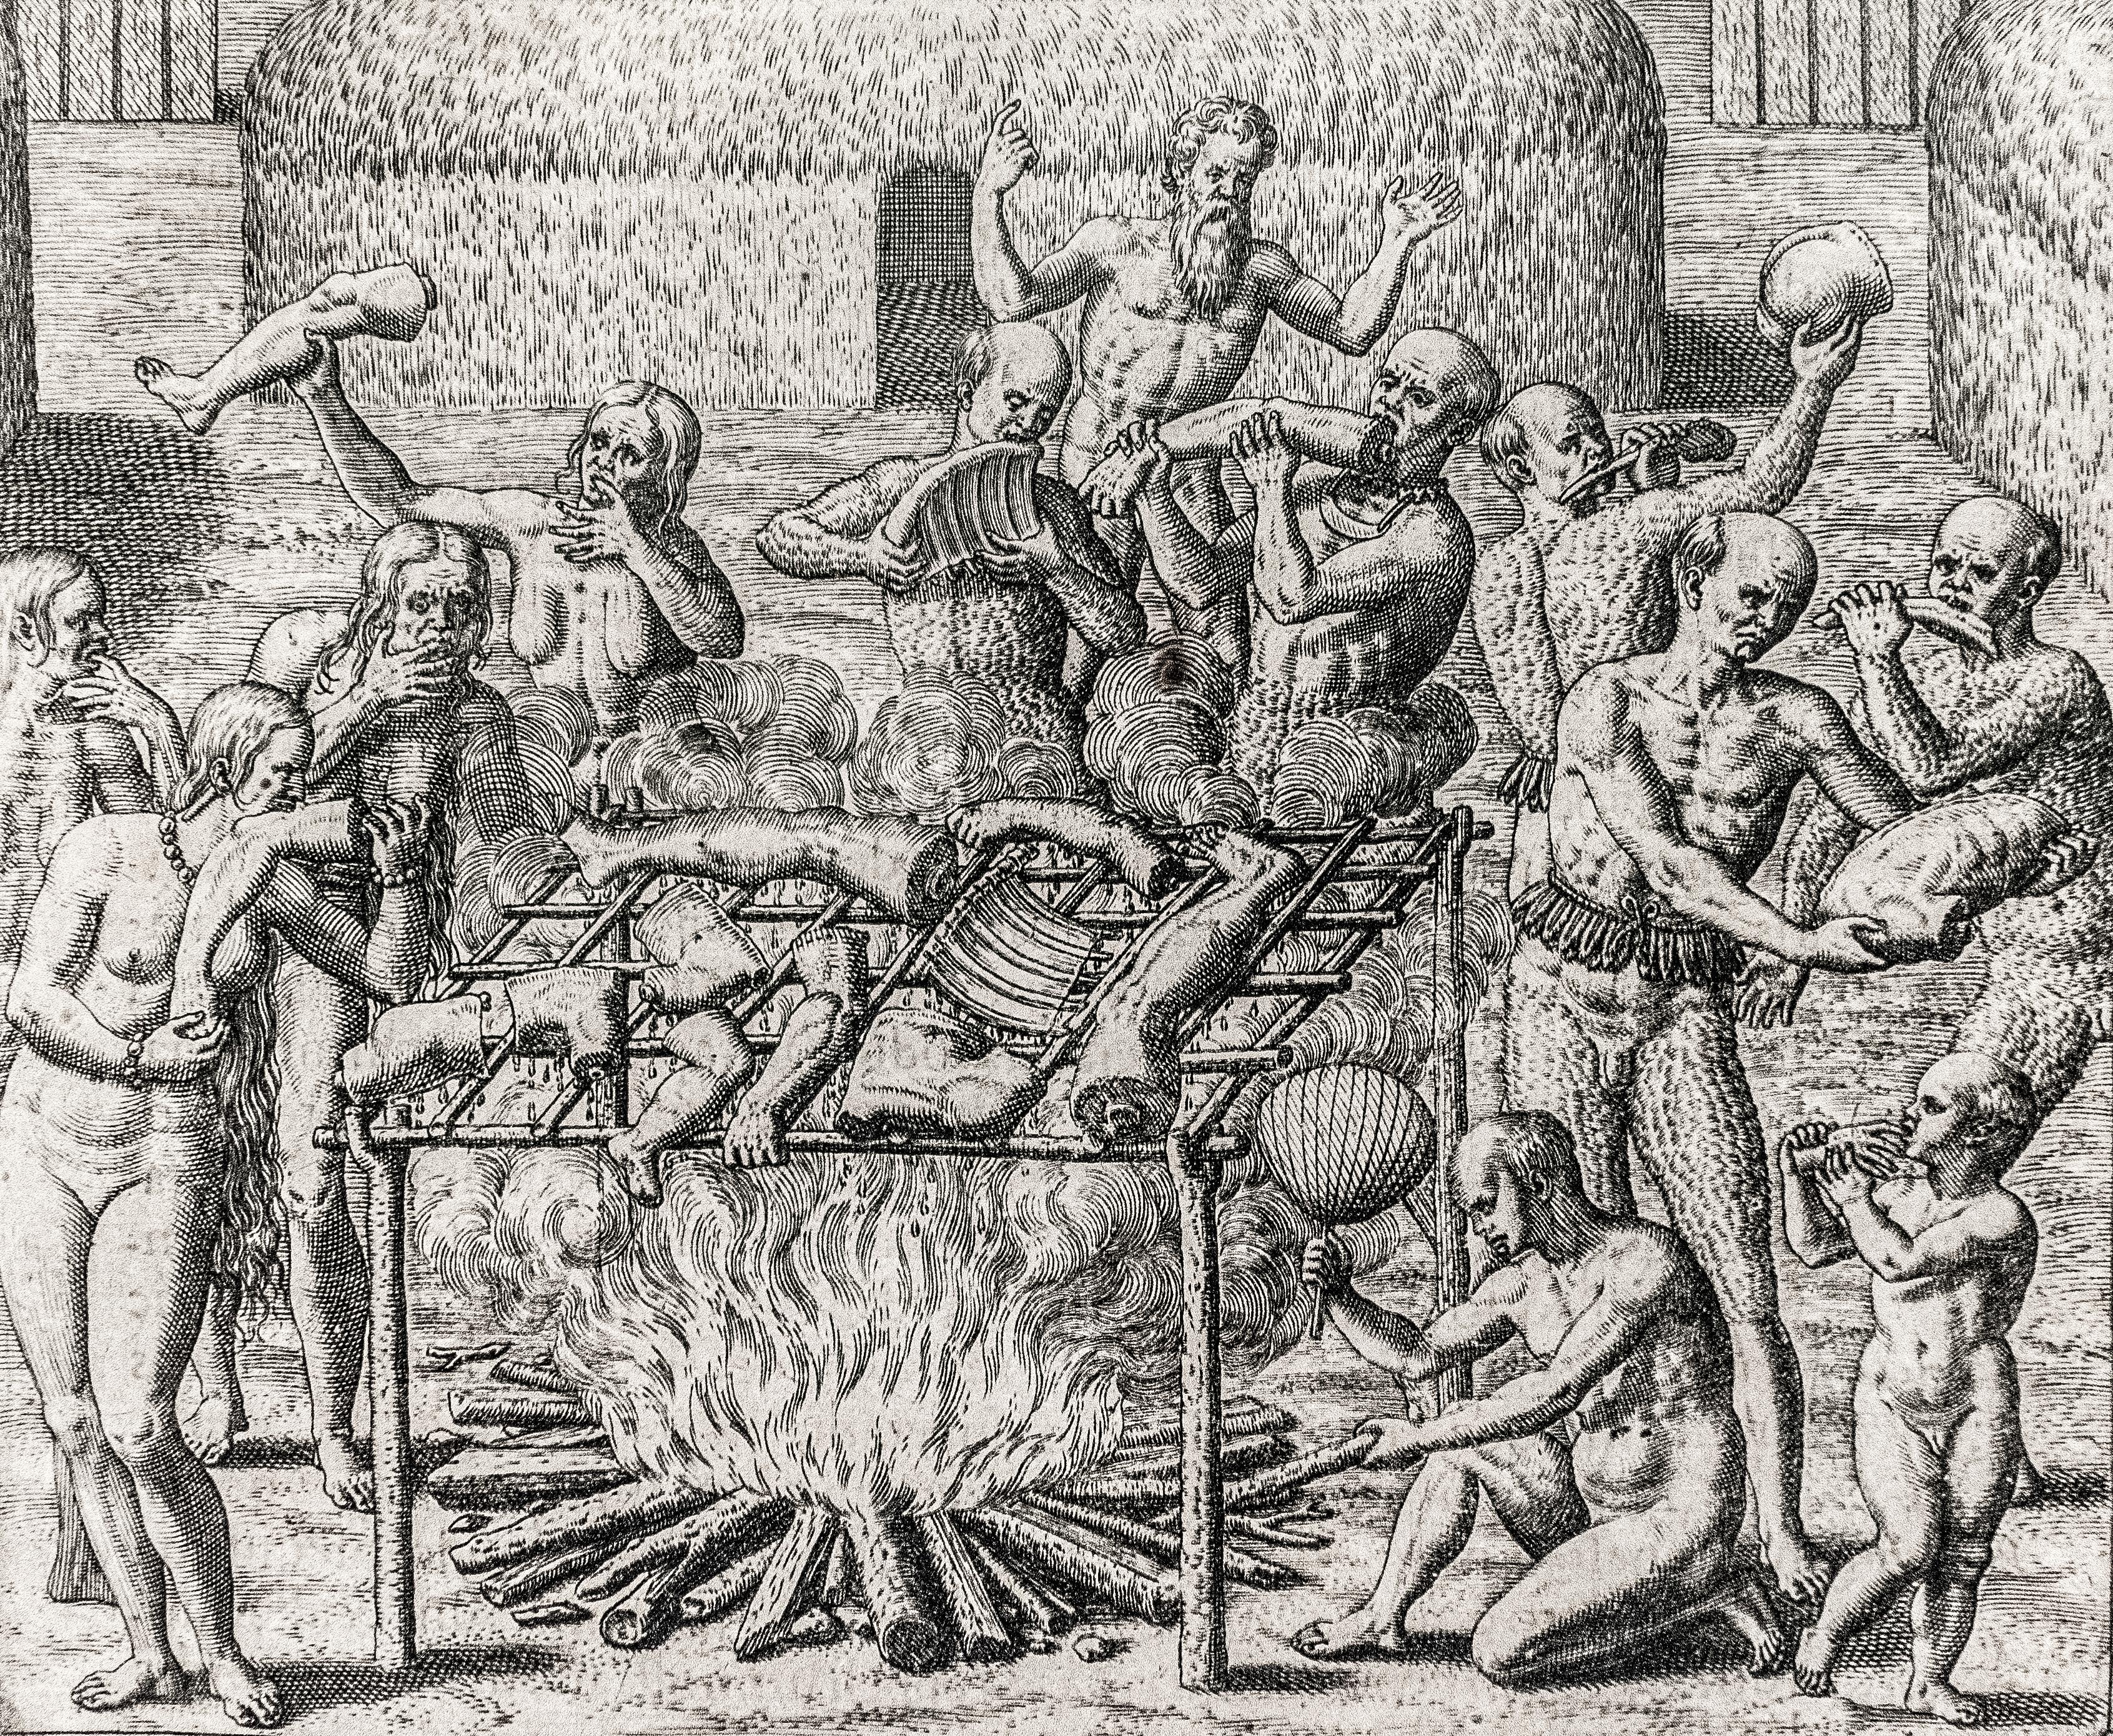 Theodor de Bry, Engraving of cannibals